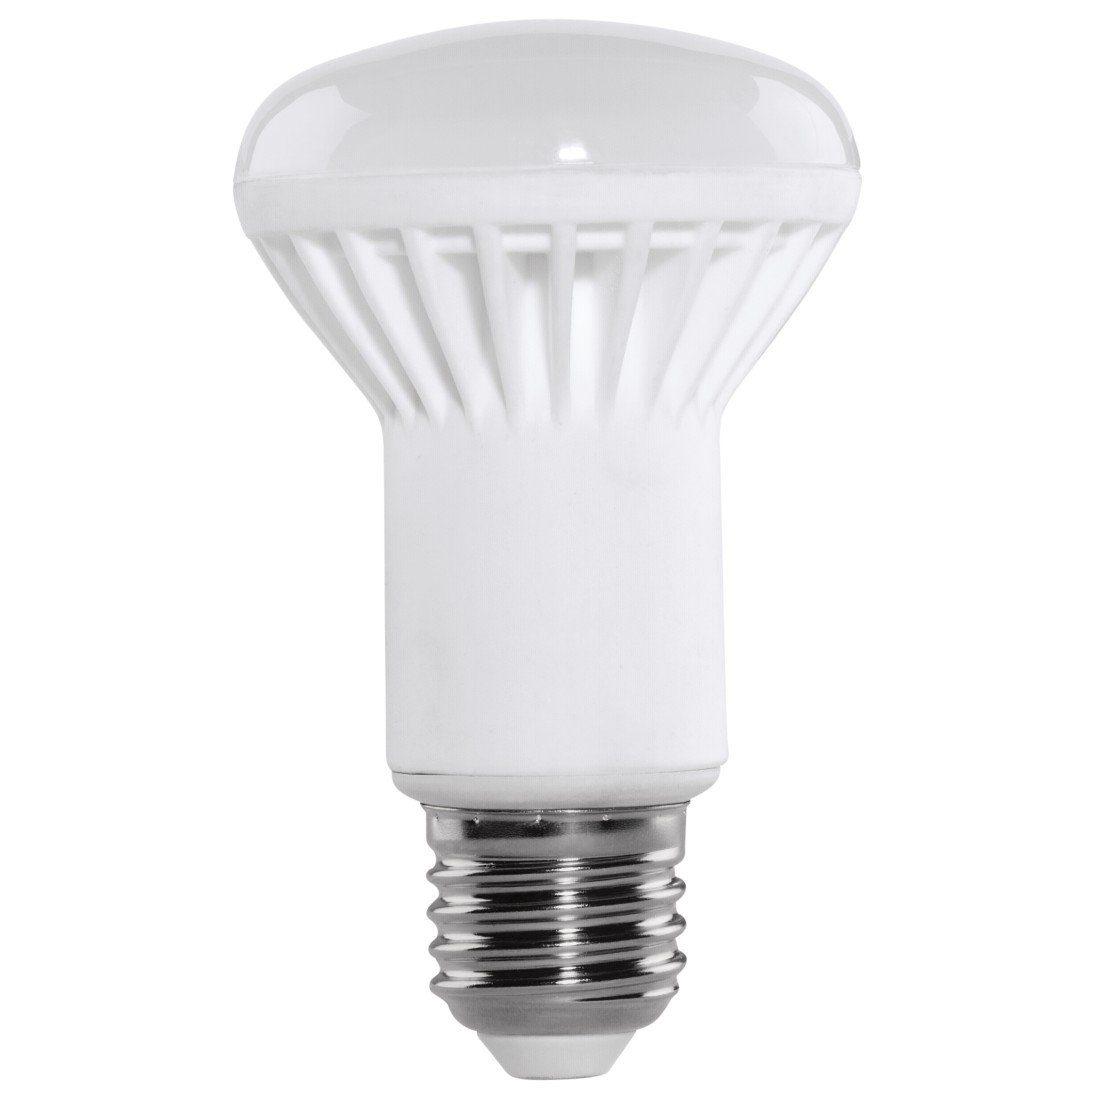 Xavax LED-Lampe, E27, 560lm ersetzt 45W Reflektorlampe R63, Warmweiß